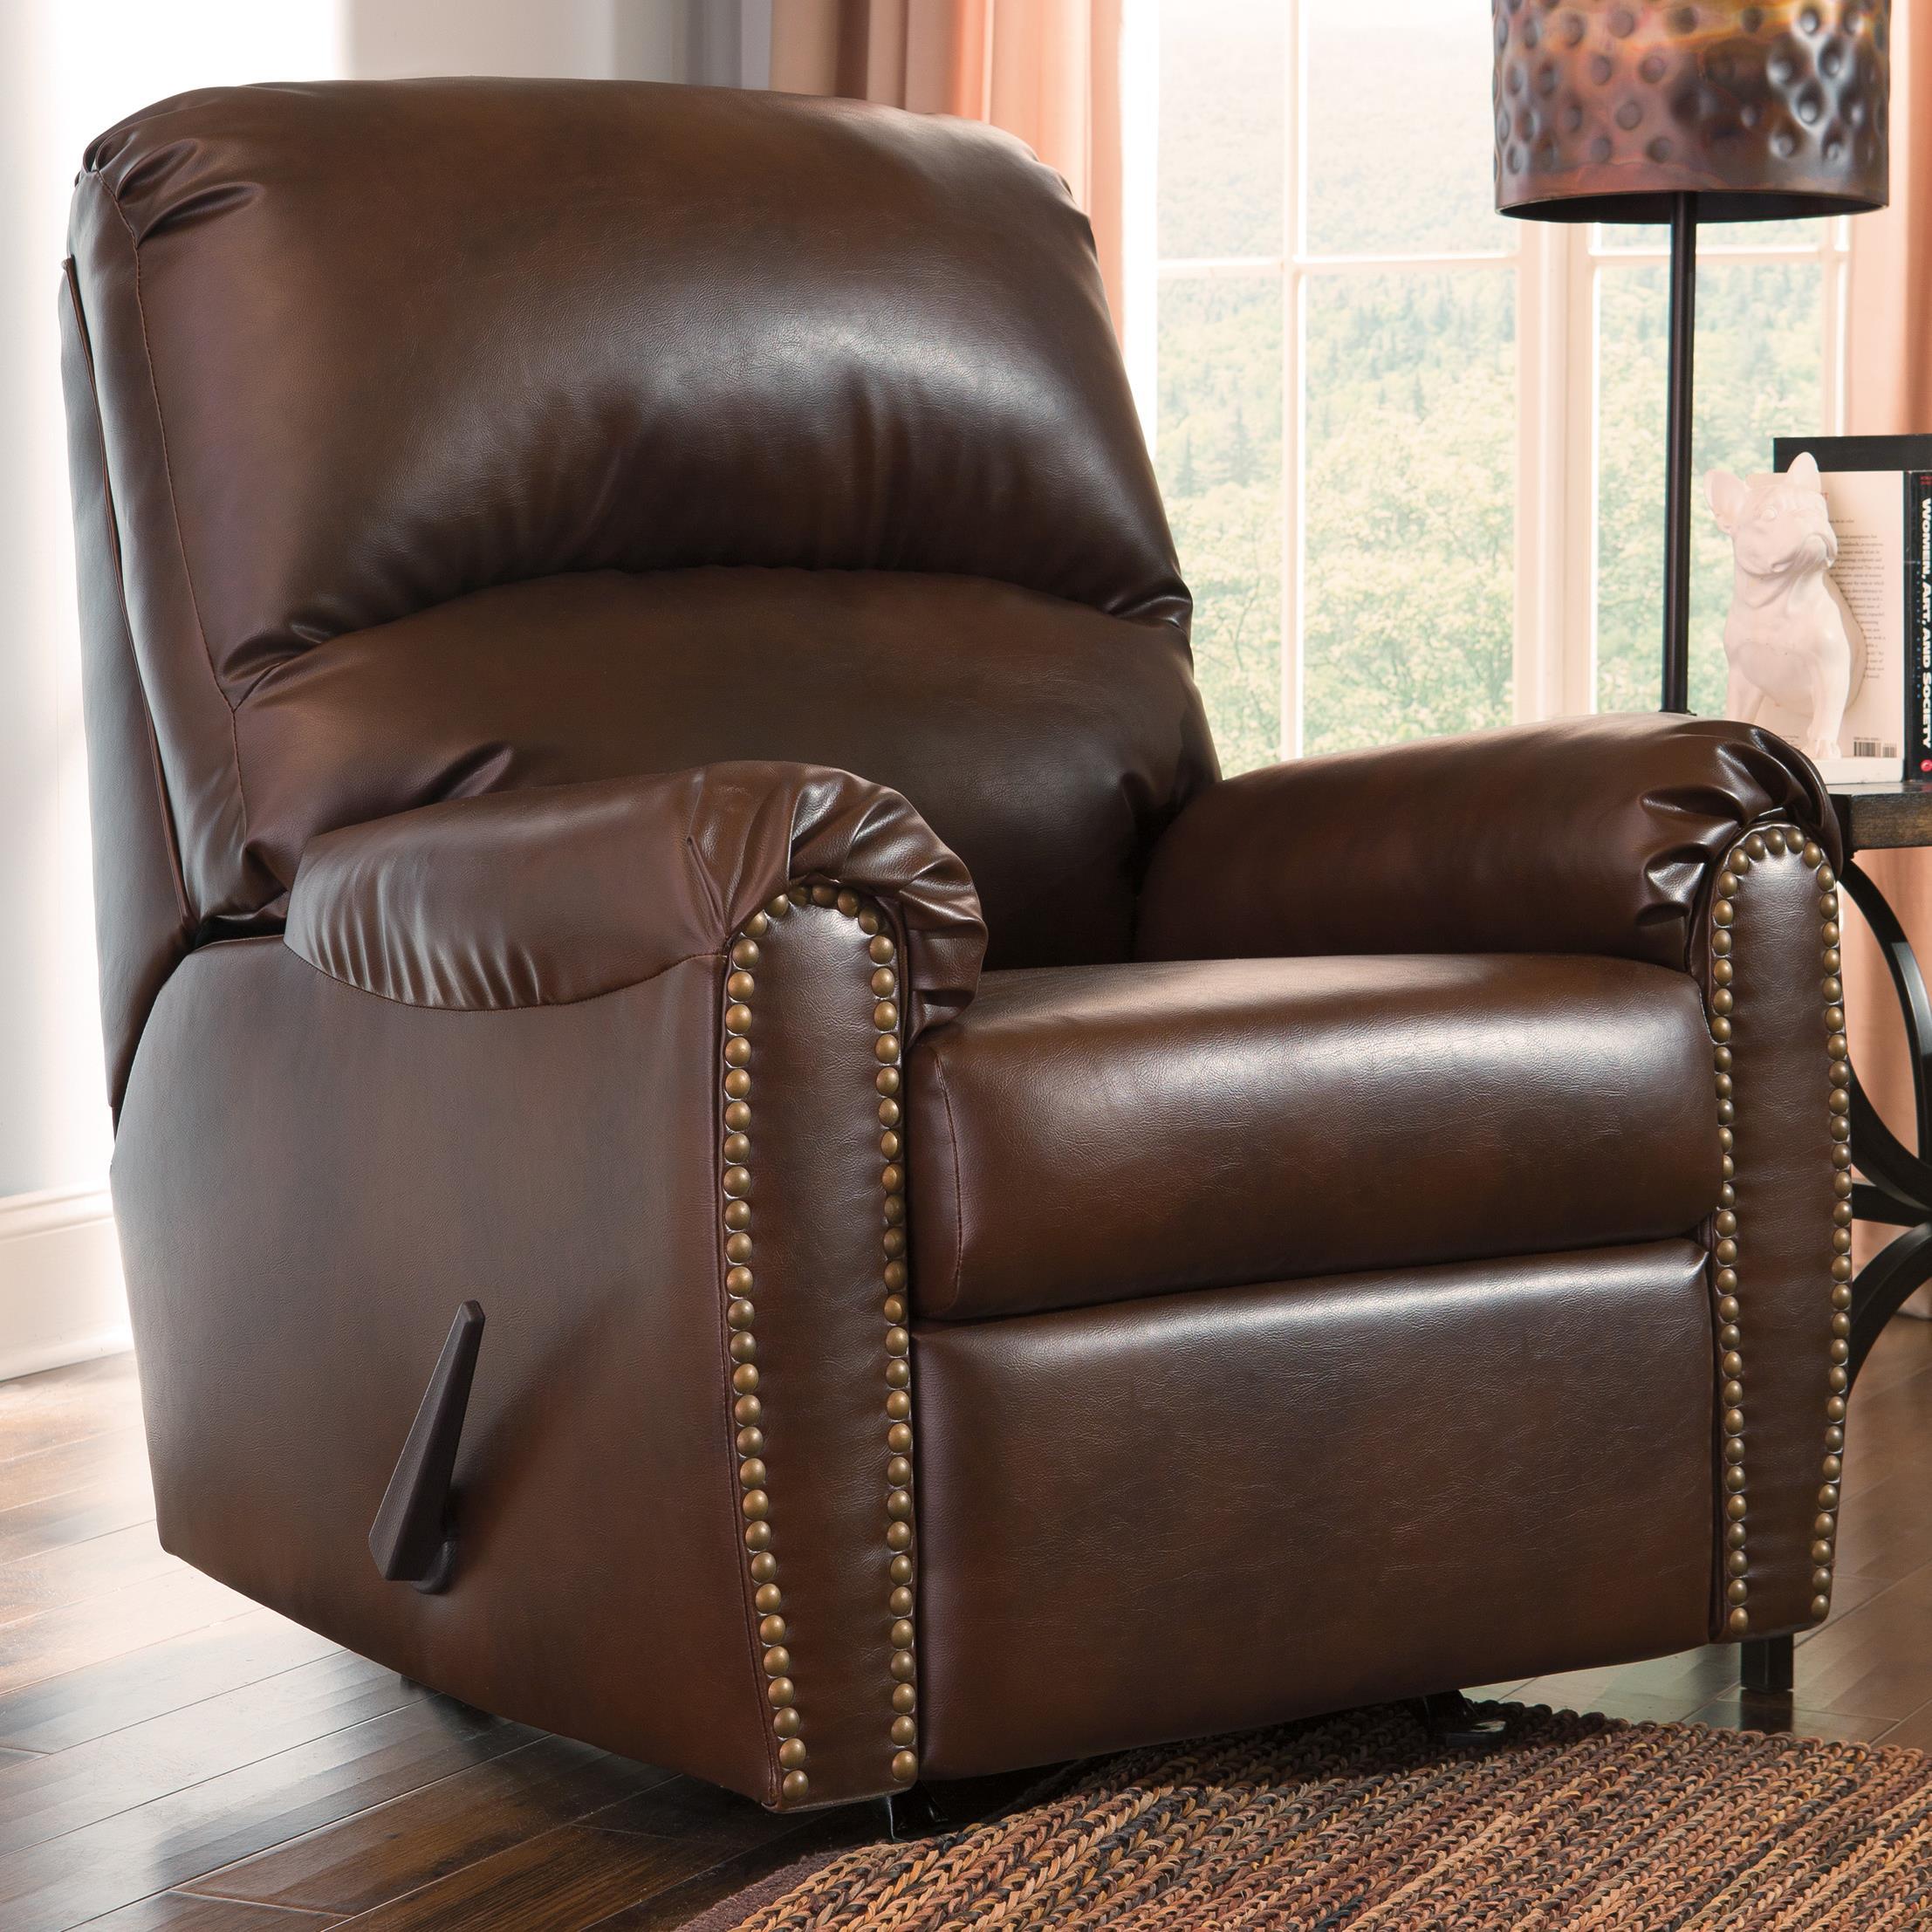 signature design by ashley lottie durablend rocker recliner item number - Ashley Furniture Recliners